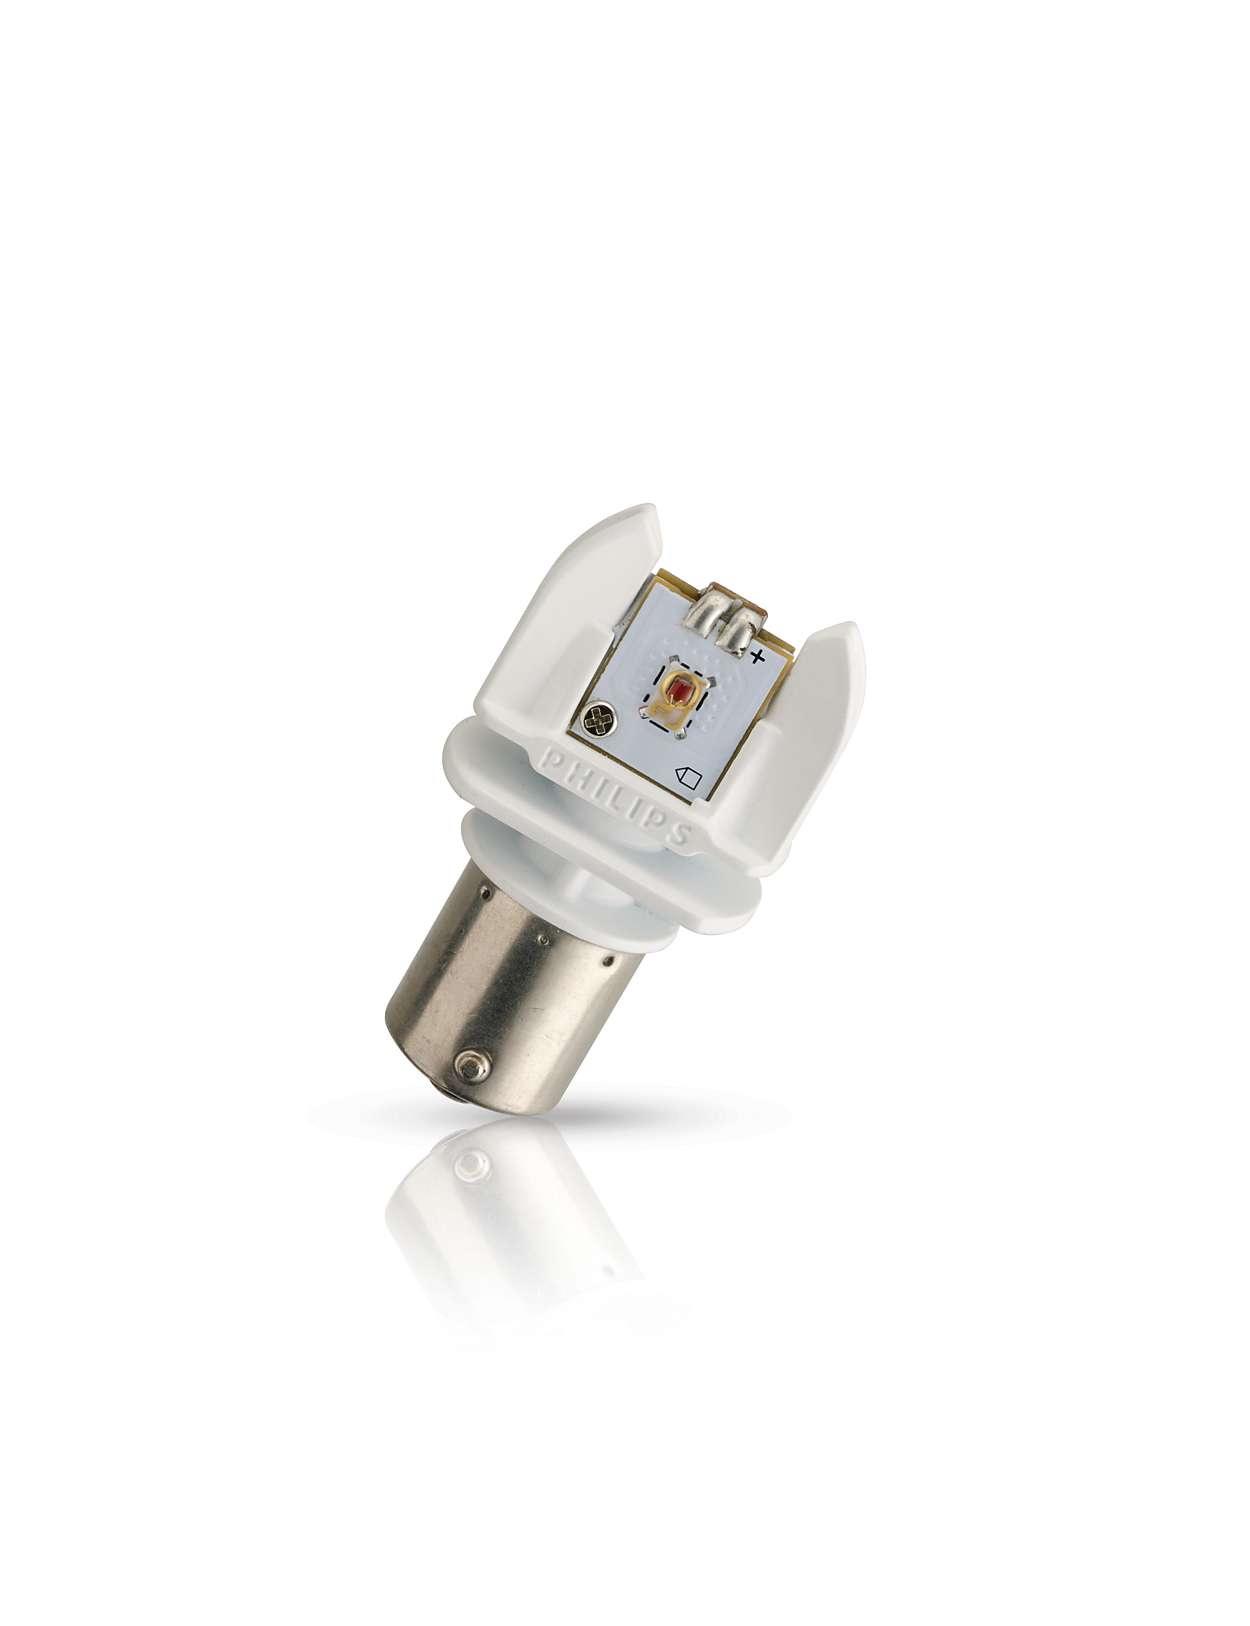 Лампа автомобильная Philips 12898rx2 автомобильная лампа r5w 5w longlife ecovision 2 шт philips